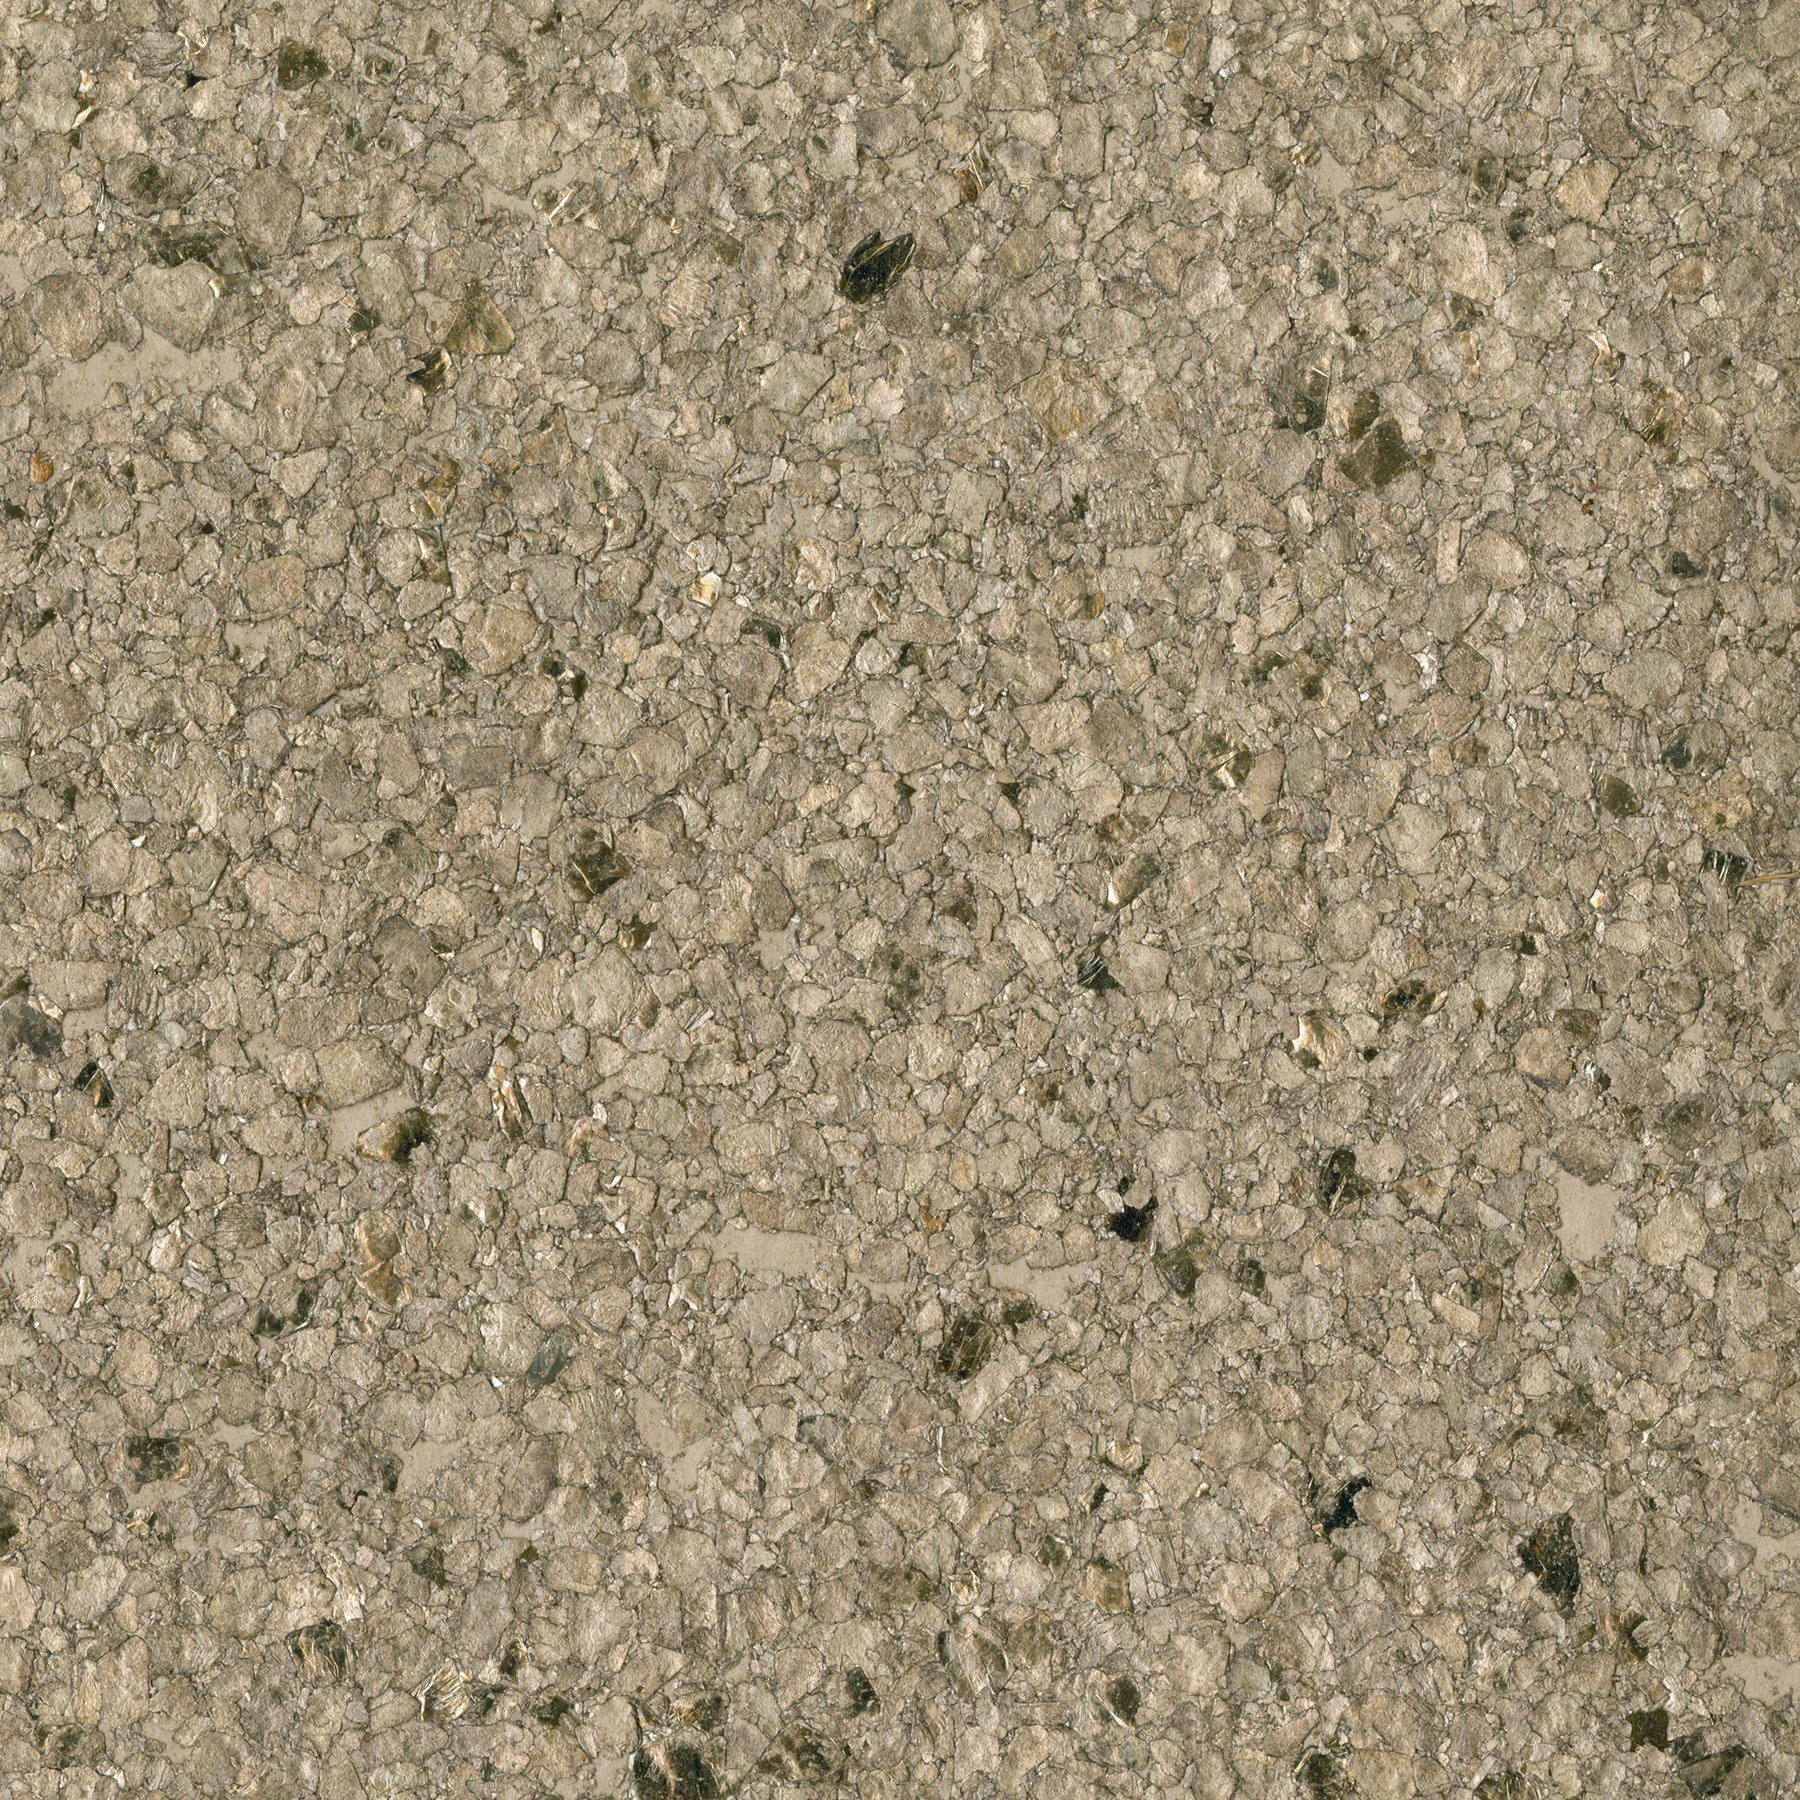 Kenxb|#Kenneth James 2693-30242 Tenso Bronze Mica Chip Wallpaper,